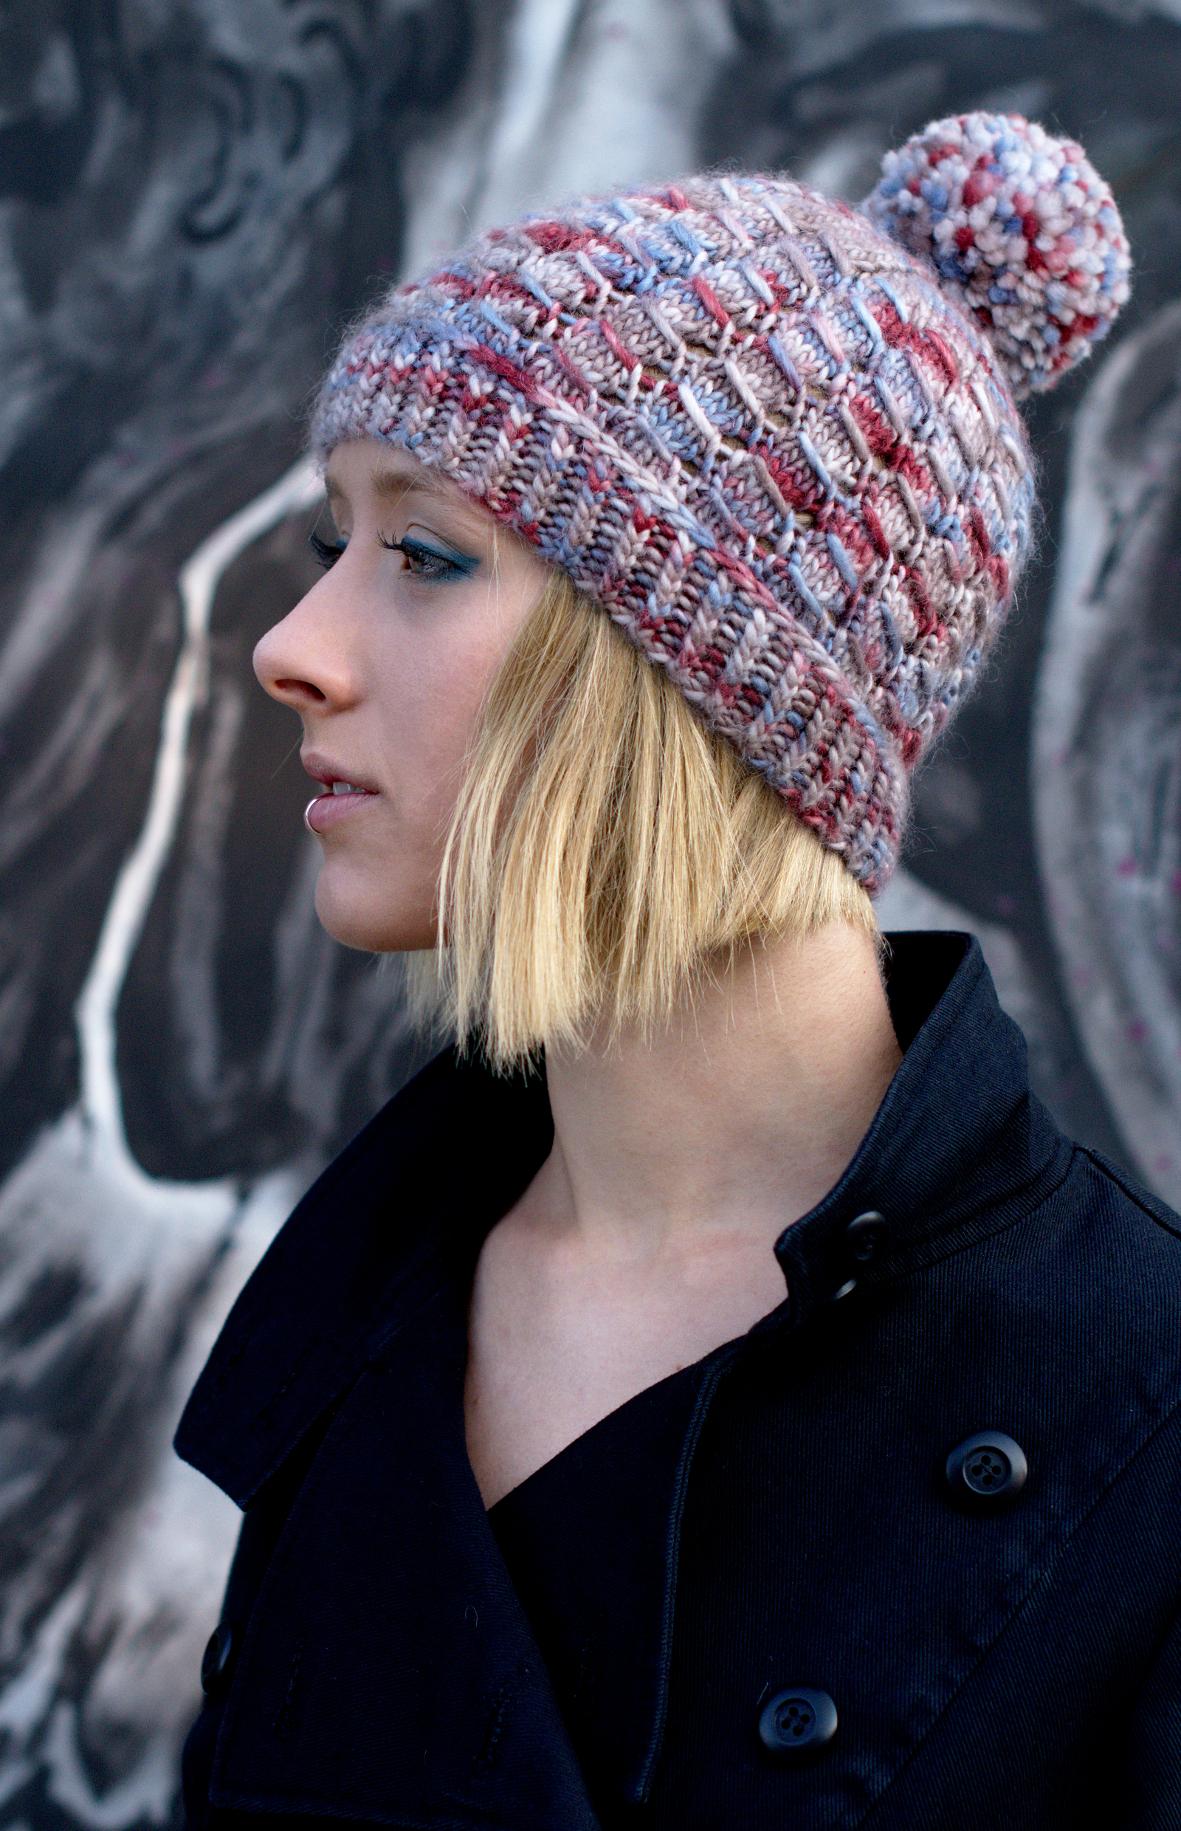 Laccio hand knit beanie pattern for aran weight yarn